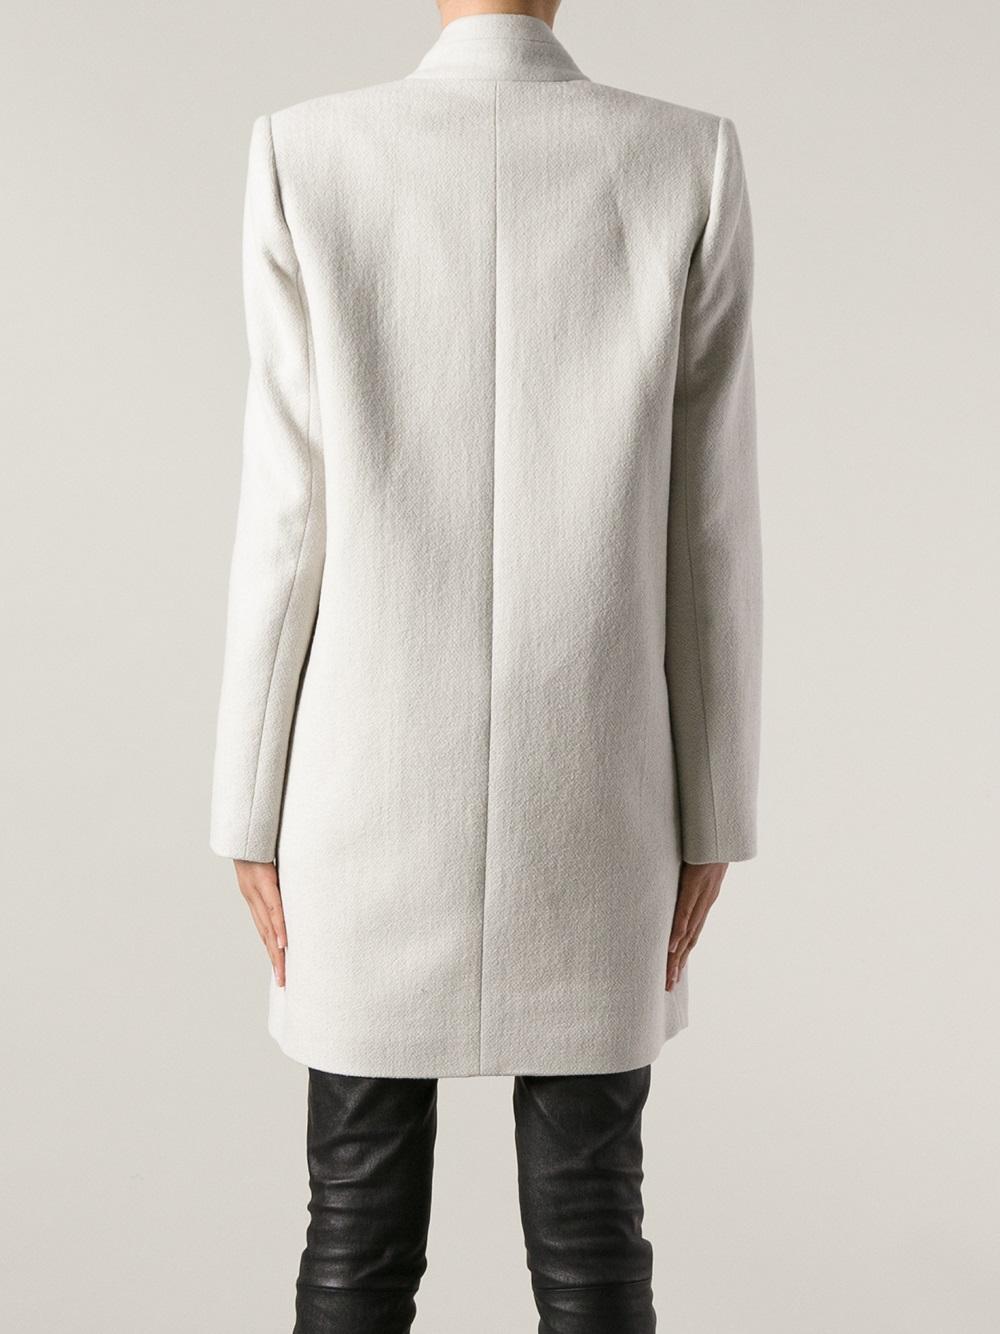 Isabel Marant Oversize Coat In White Lyst